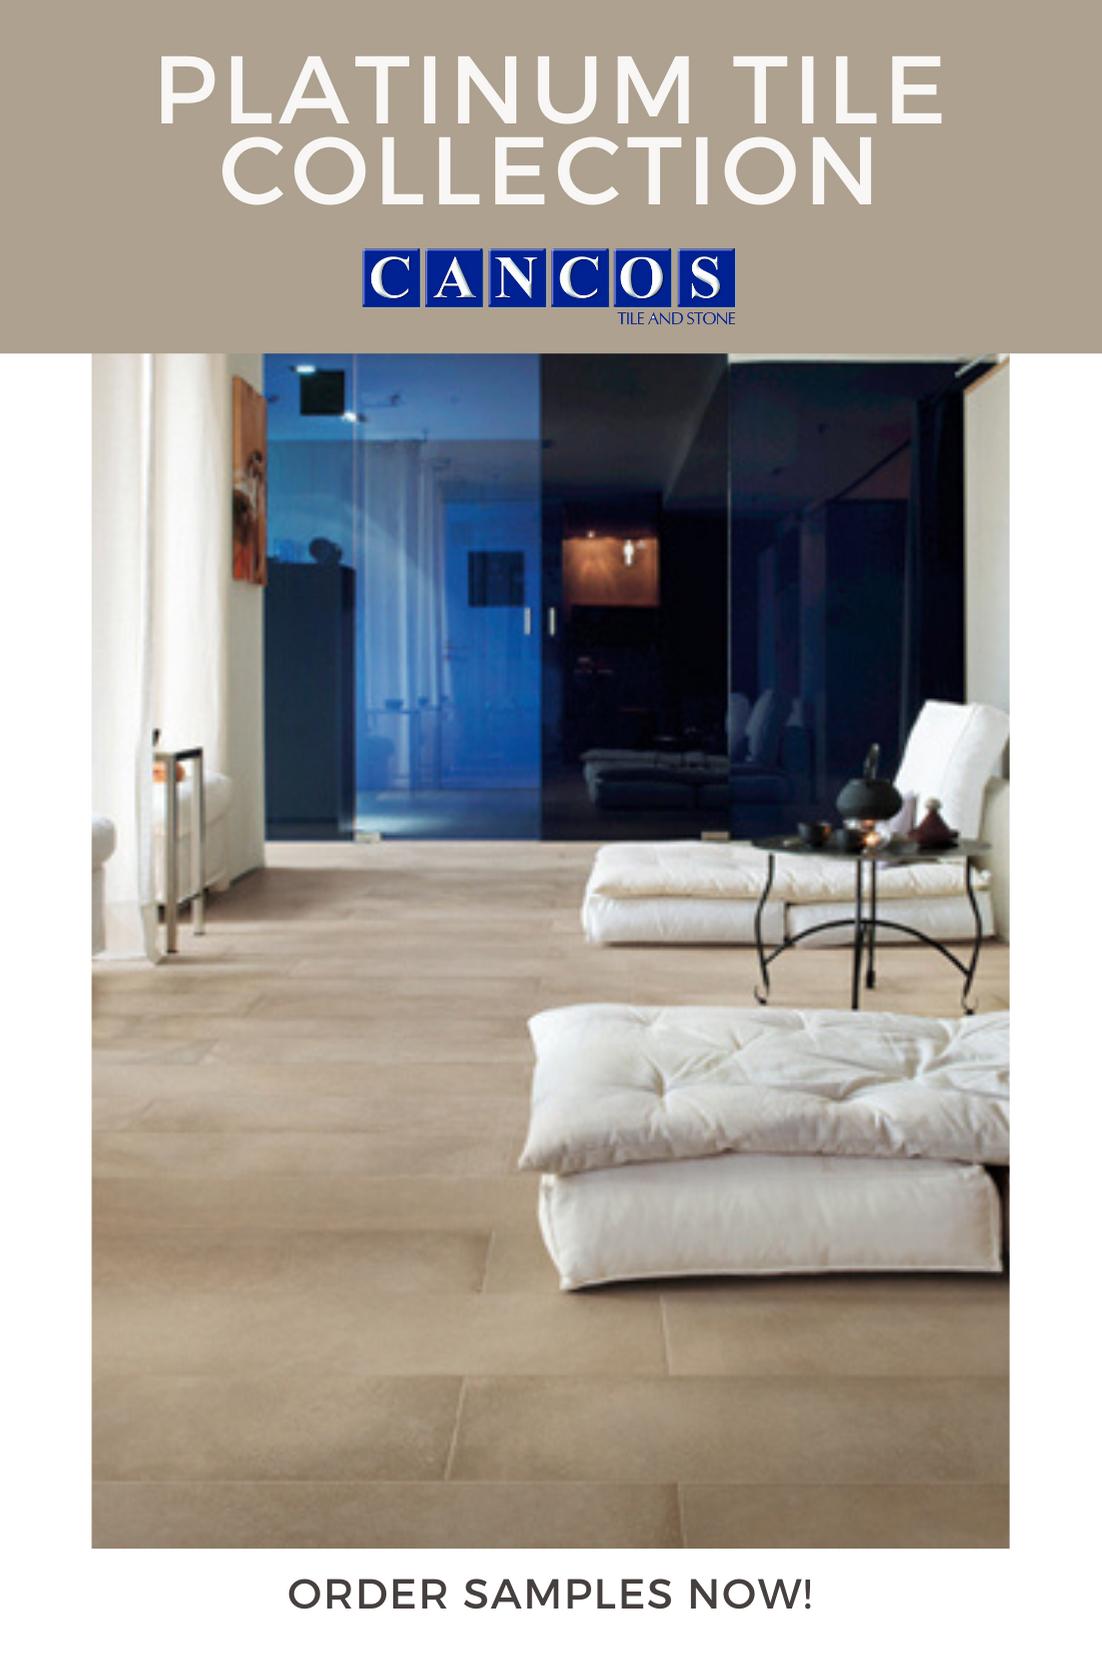 80 Bedroom Tile Stone Ideas In 2020 Tile Bedroom Bed